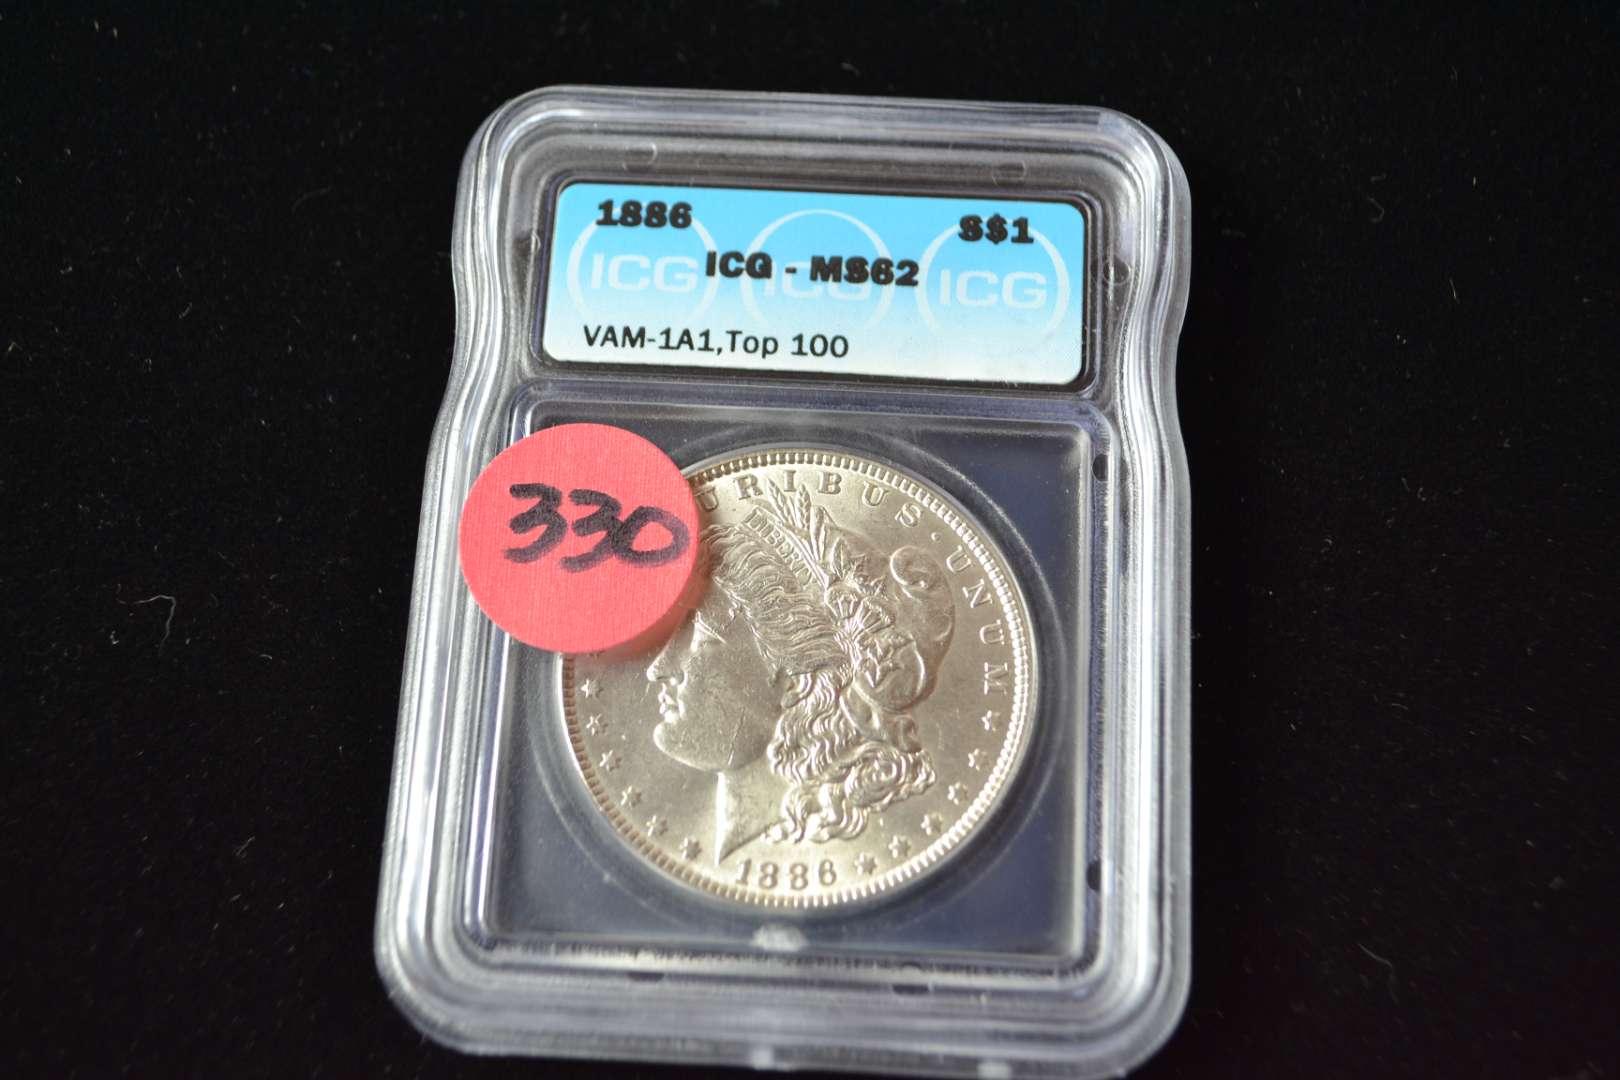 Lot # 330 1886 MORGAN SILVER DOLLAR ICG GRADED MS62